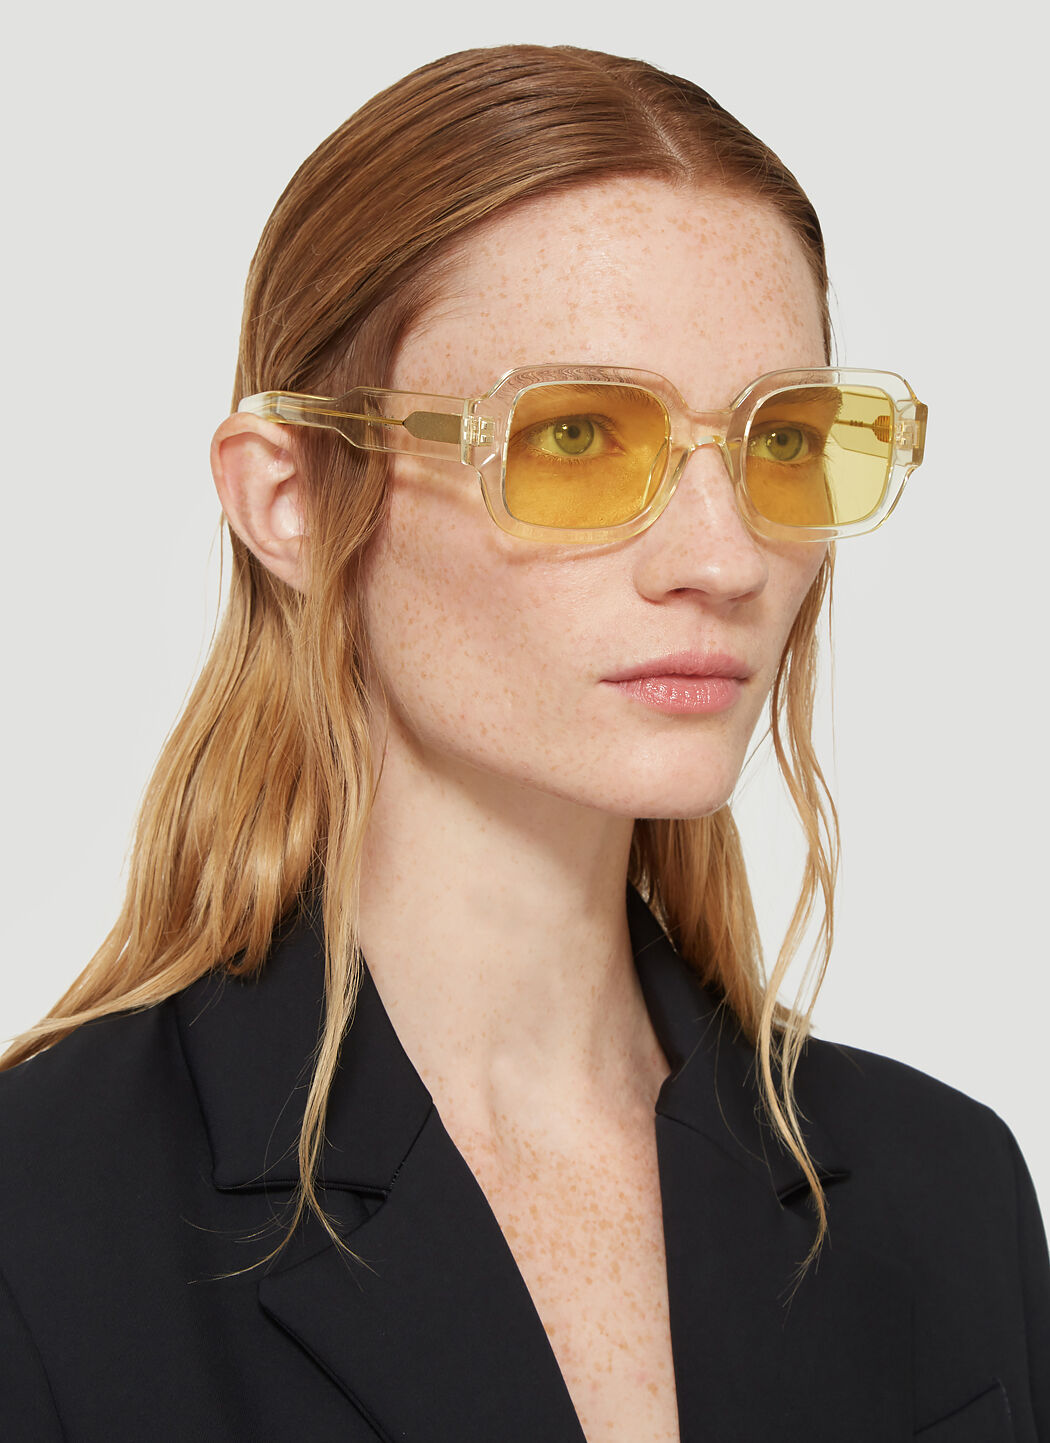 flatlist Le Specs Karen Walker KUBORAUM BERLIN buy shop online rainbow trend 2020 sunglasses fashion runway shopping